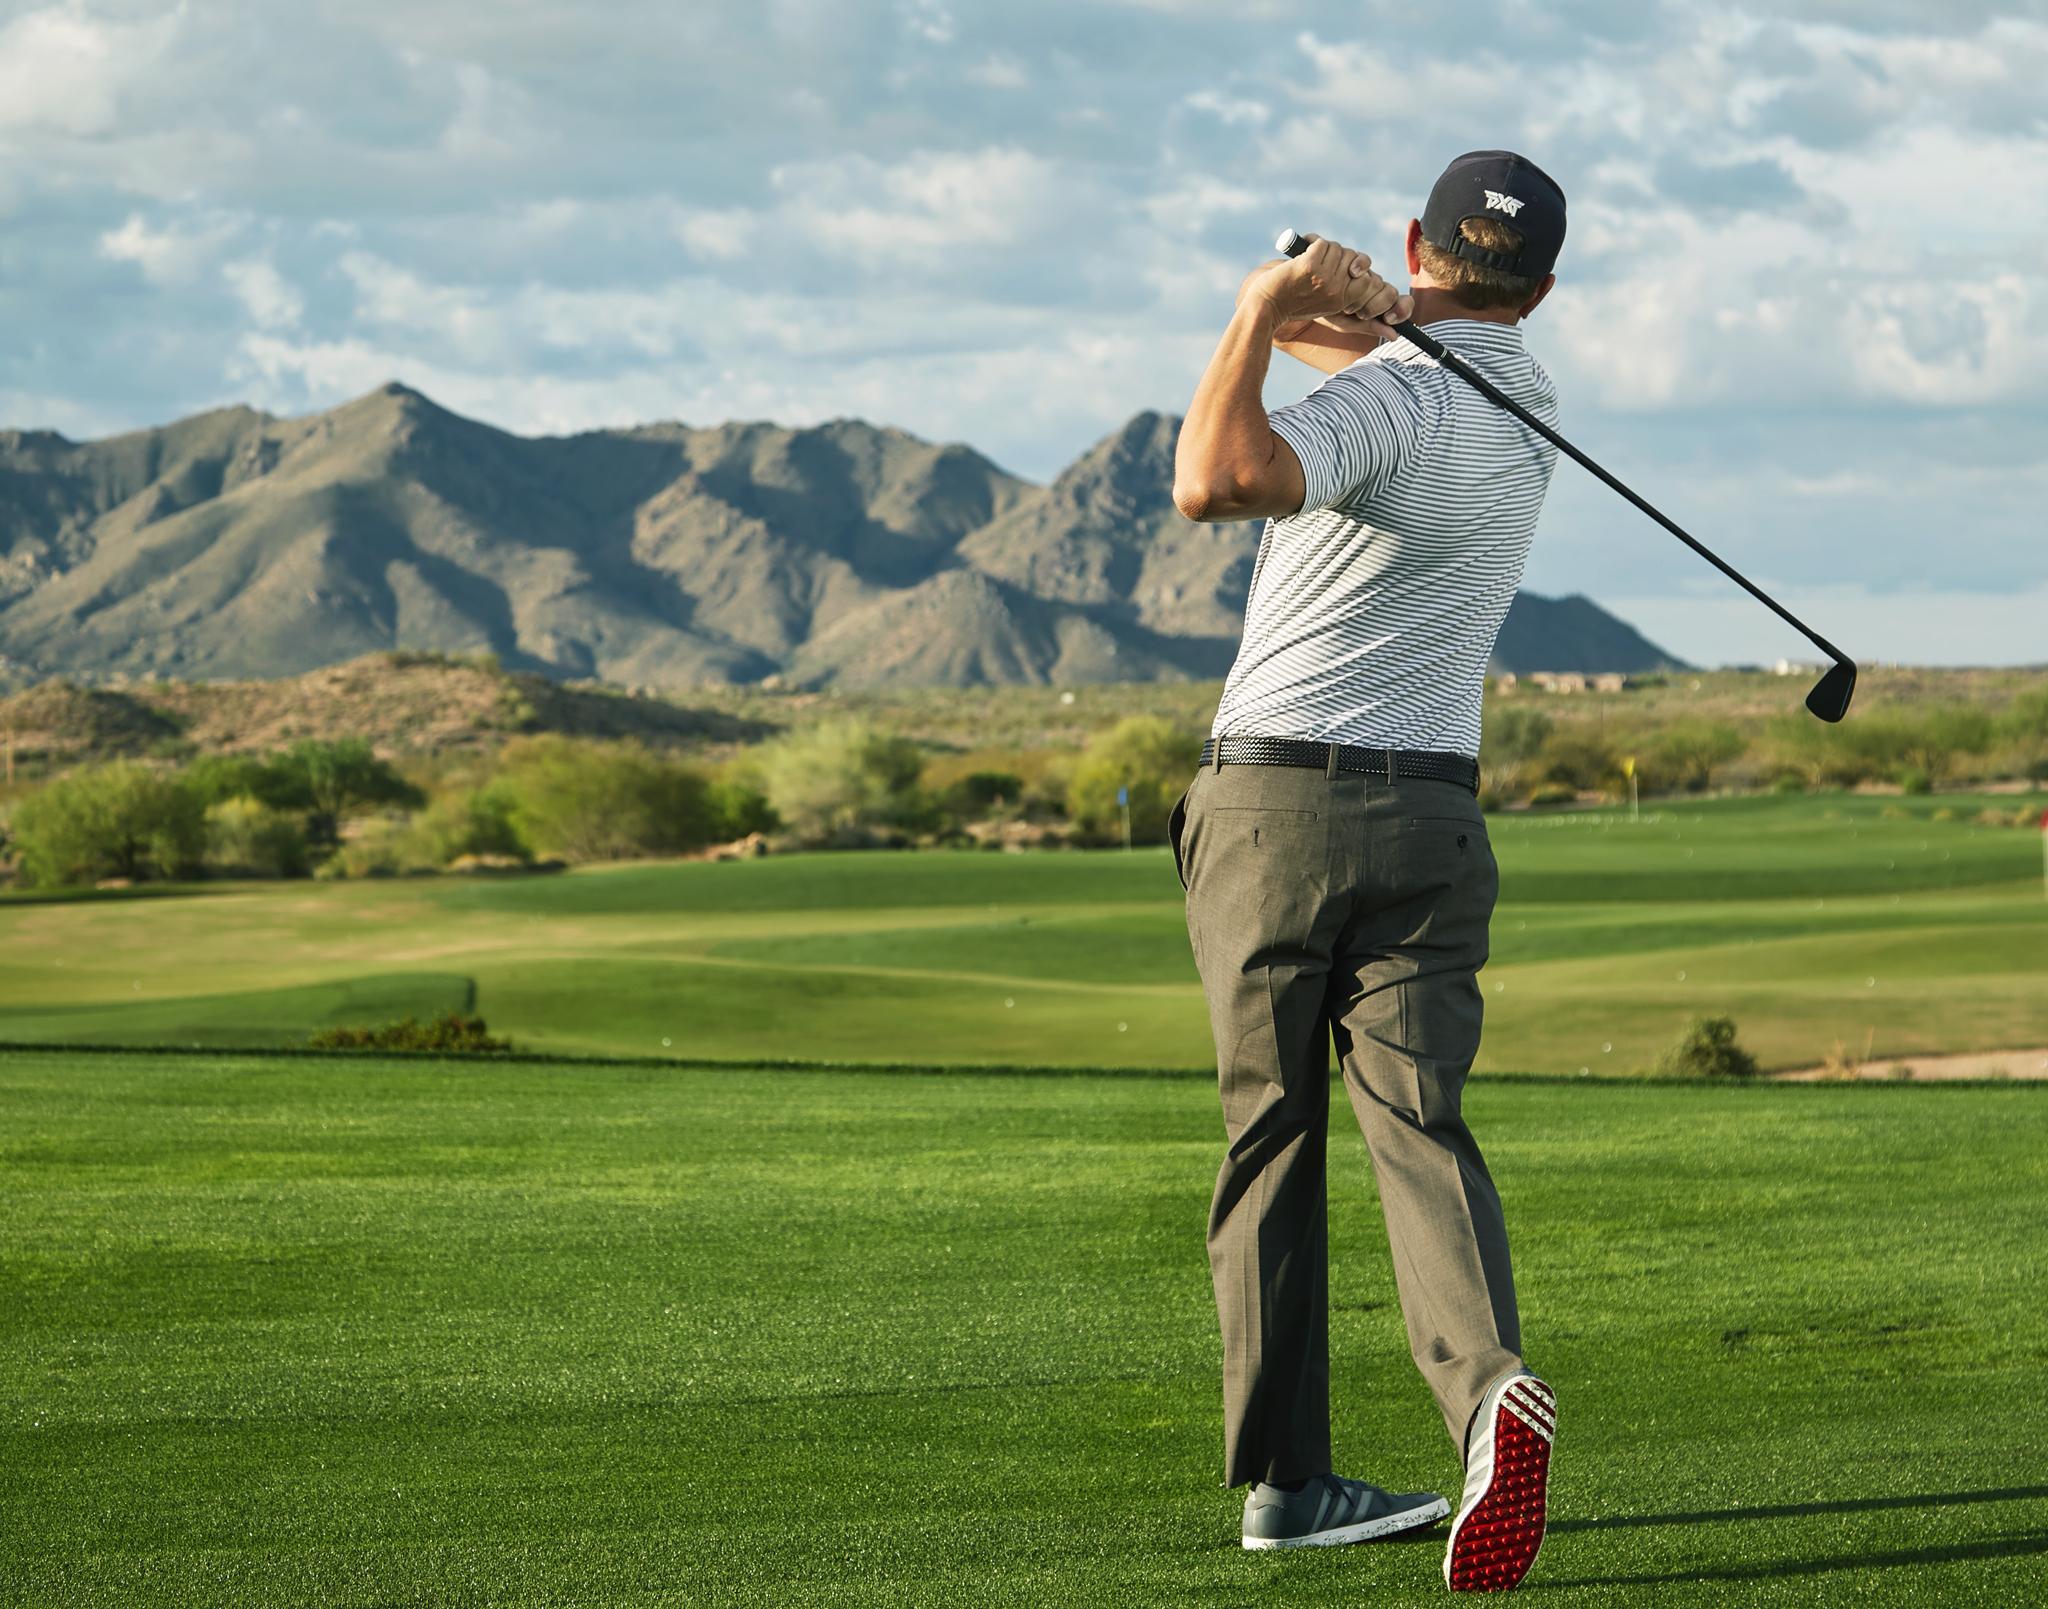 2016_Brandon-Tigrett_Scottsdale_Gabe-H_PGA_ImagesAZ-32_Retouched_WEB